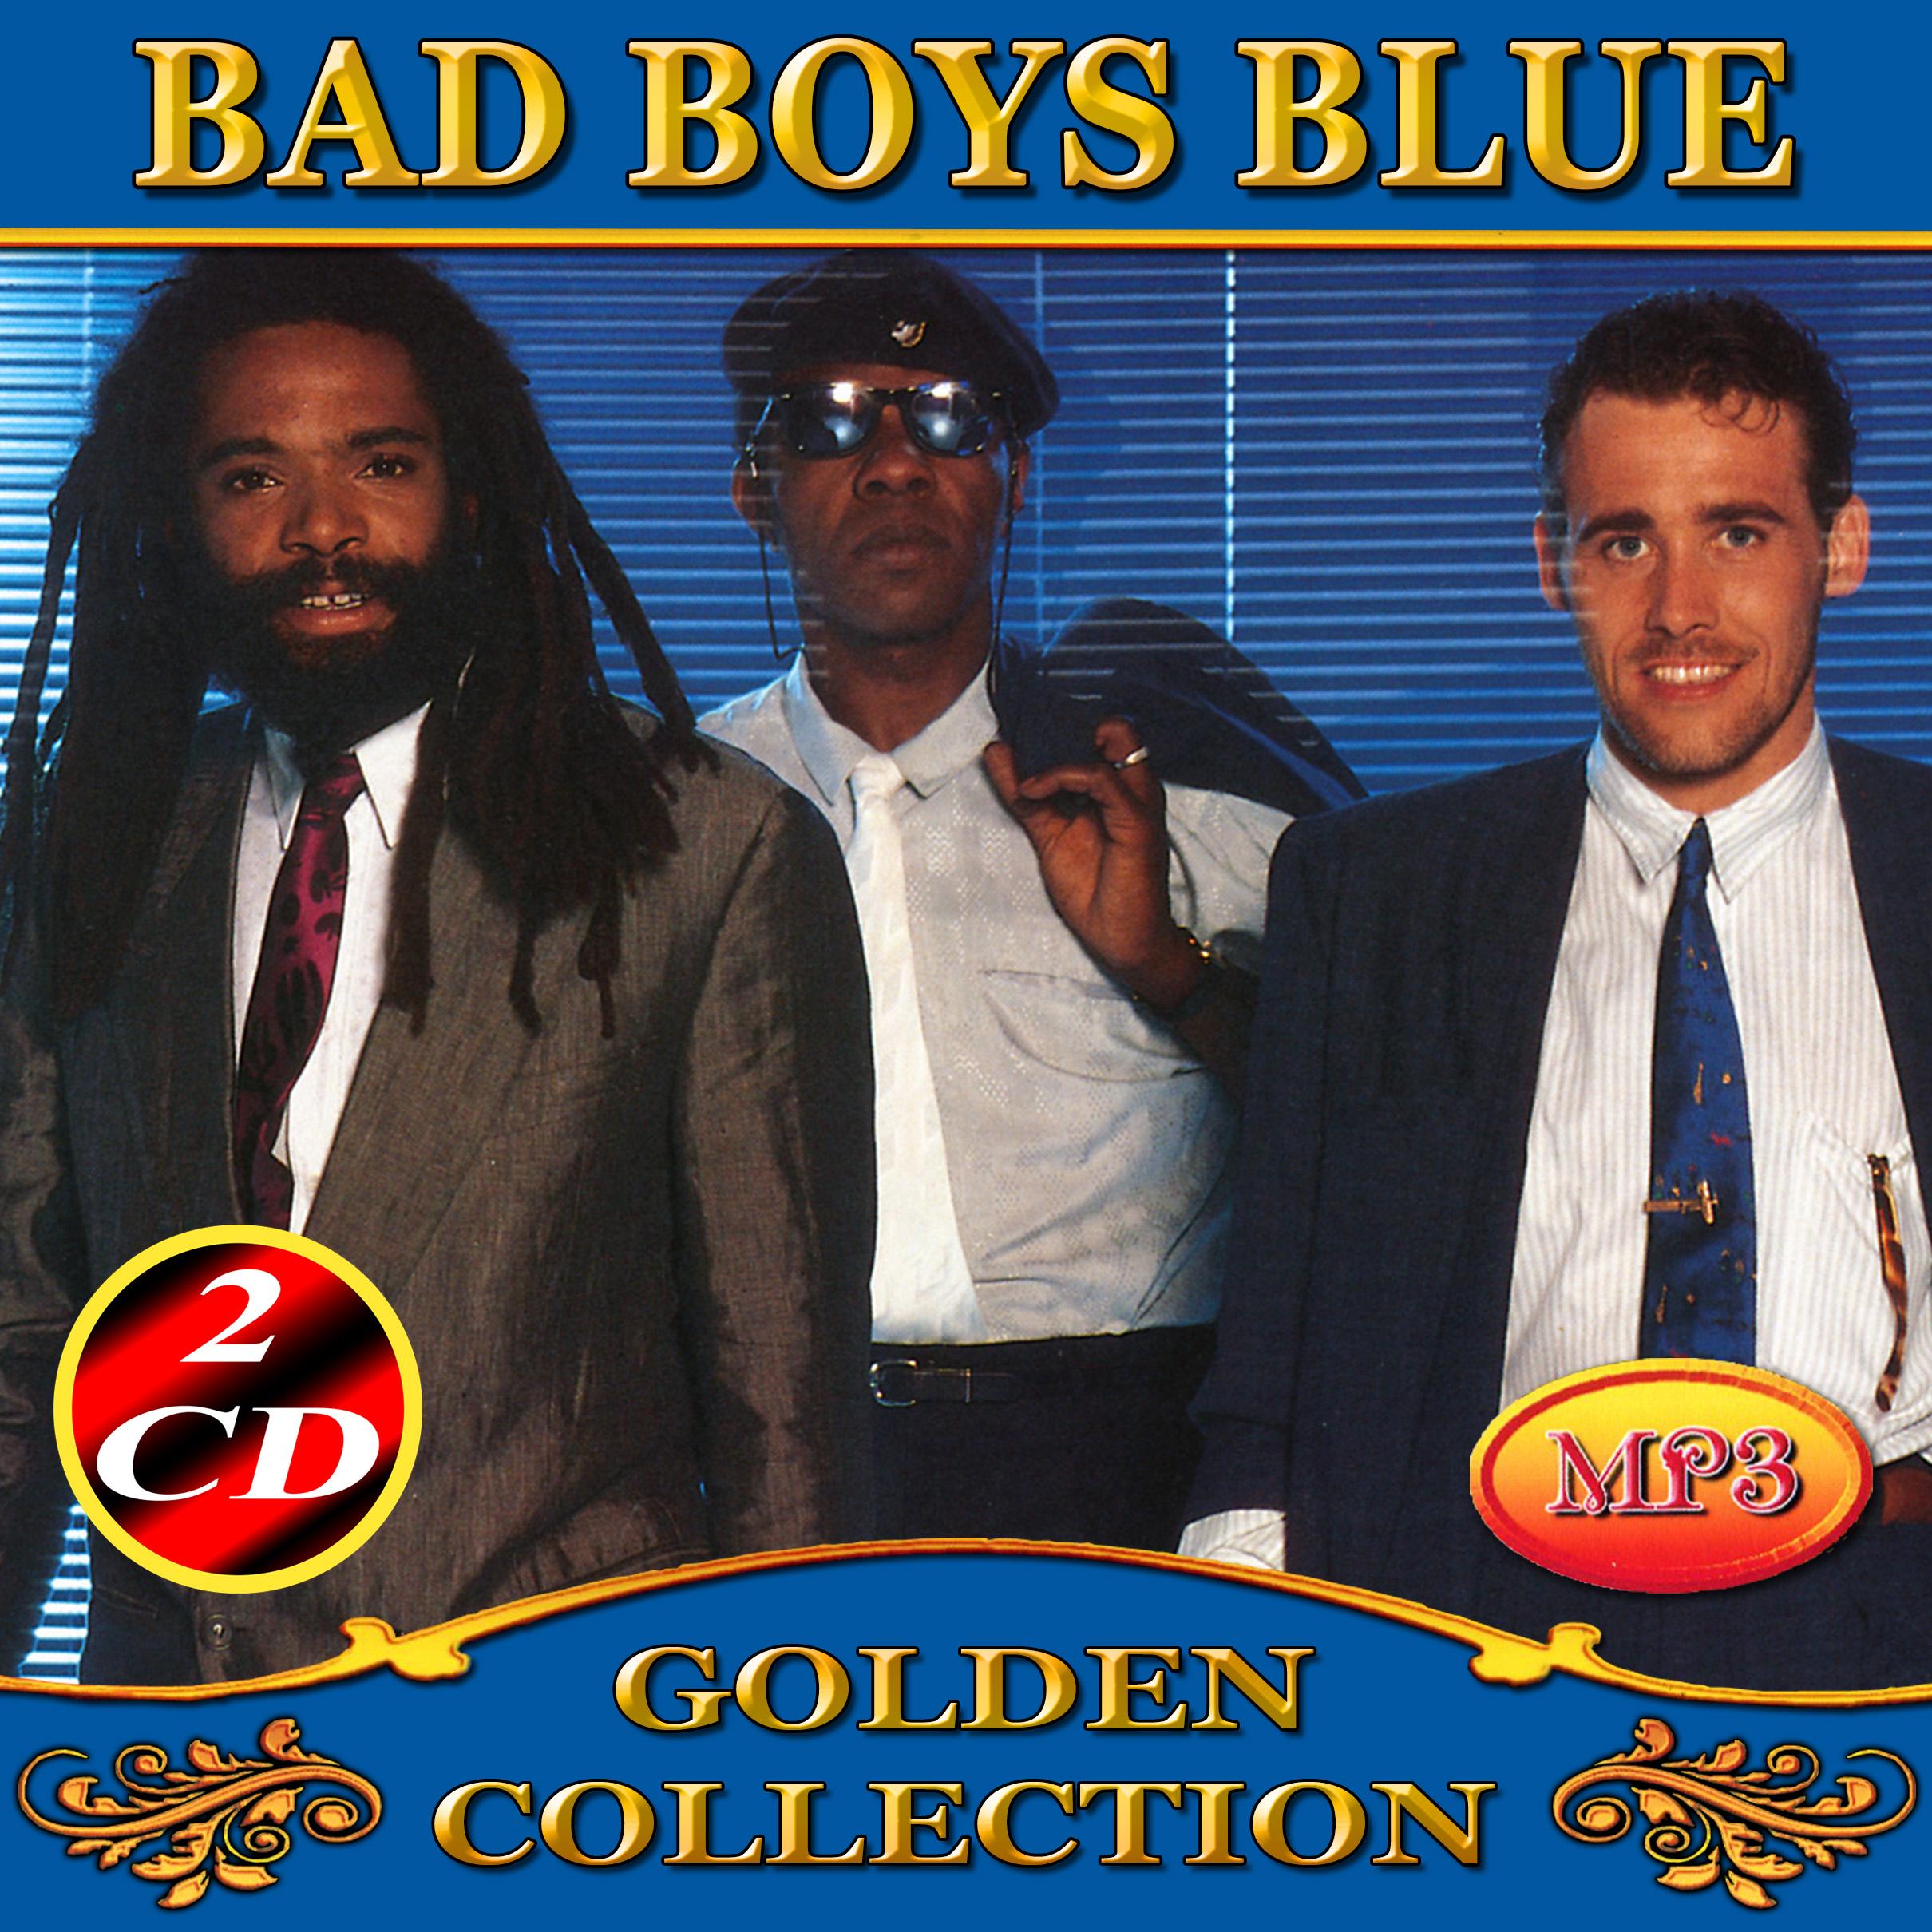 Bad Boys Blue 2cd [mp3]